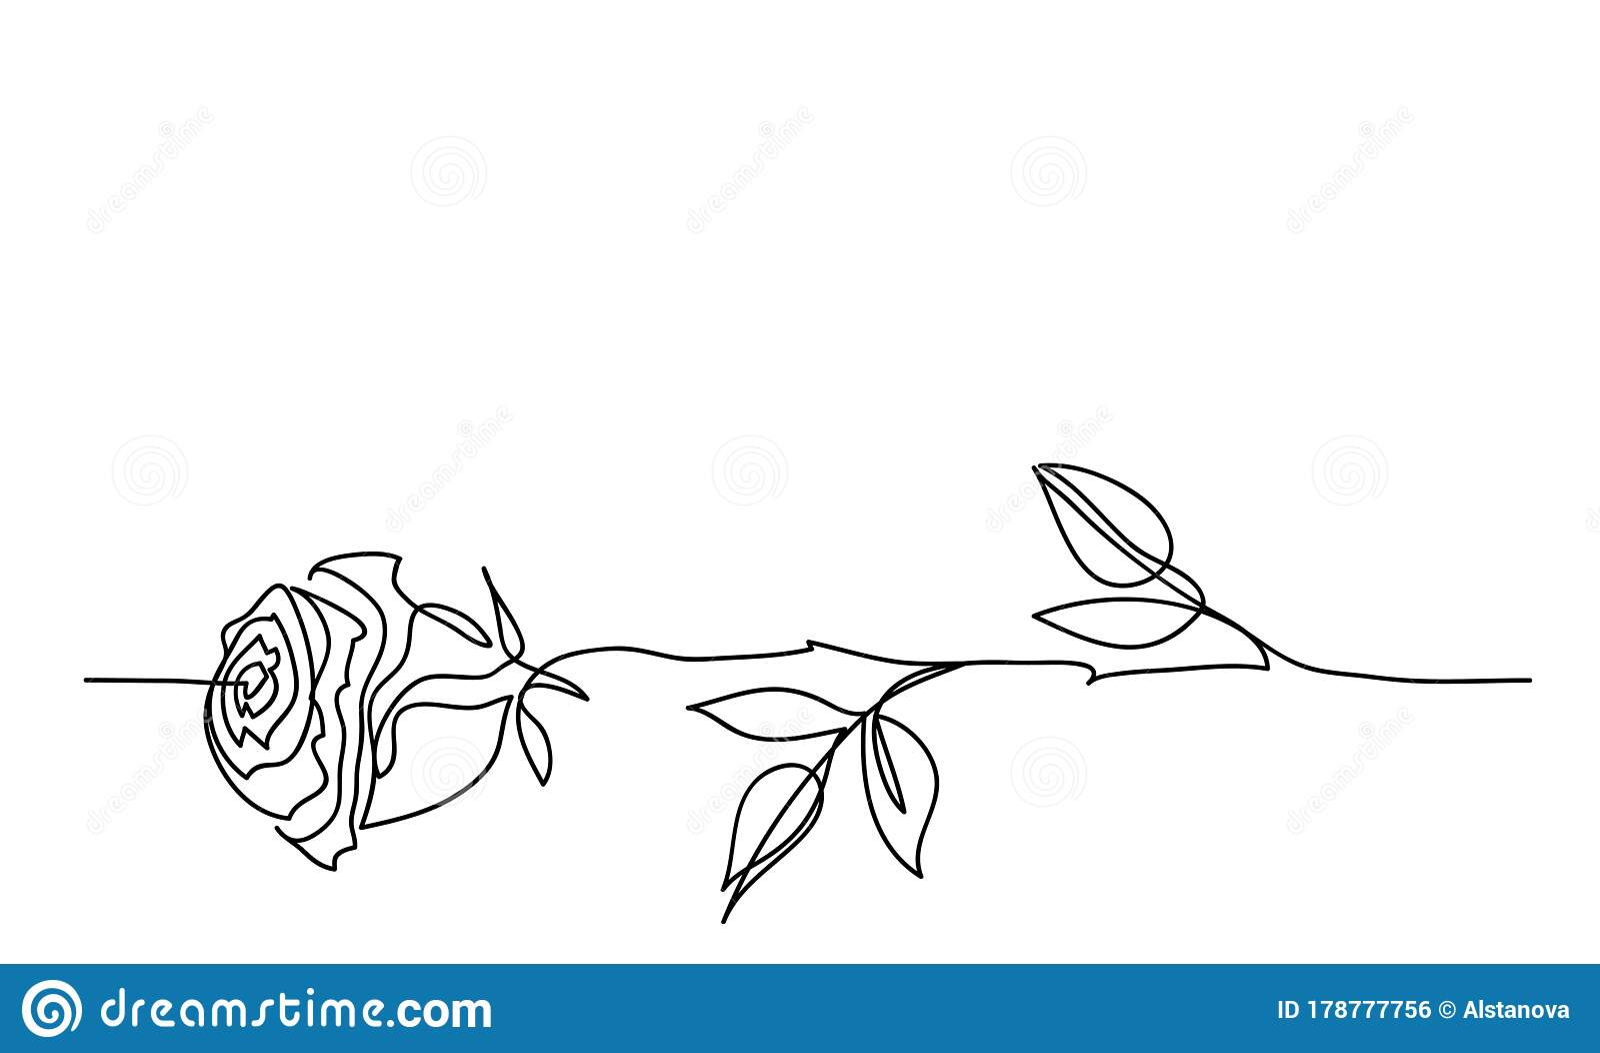 Rose Flower Minimalistic Tatoo Design  One Continuous Line